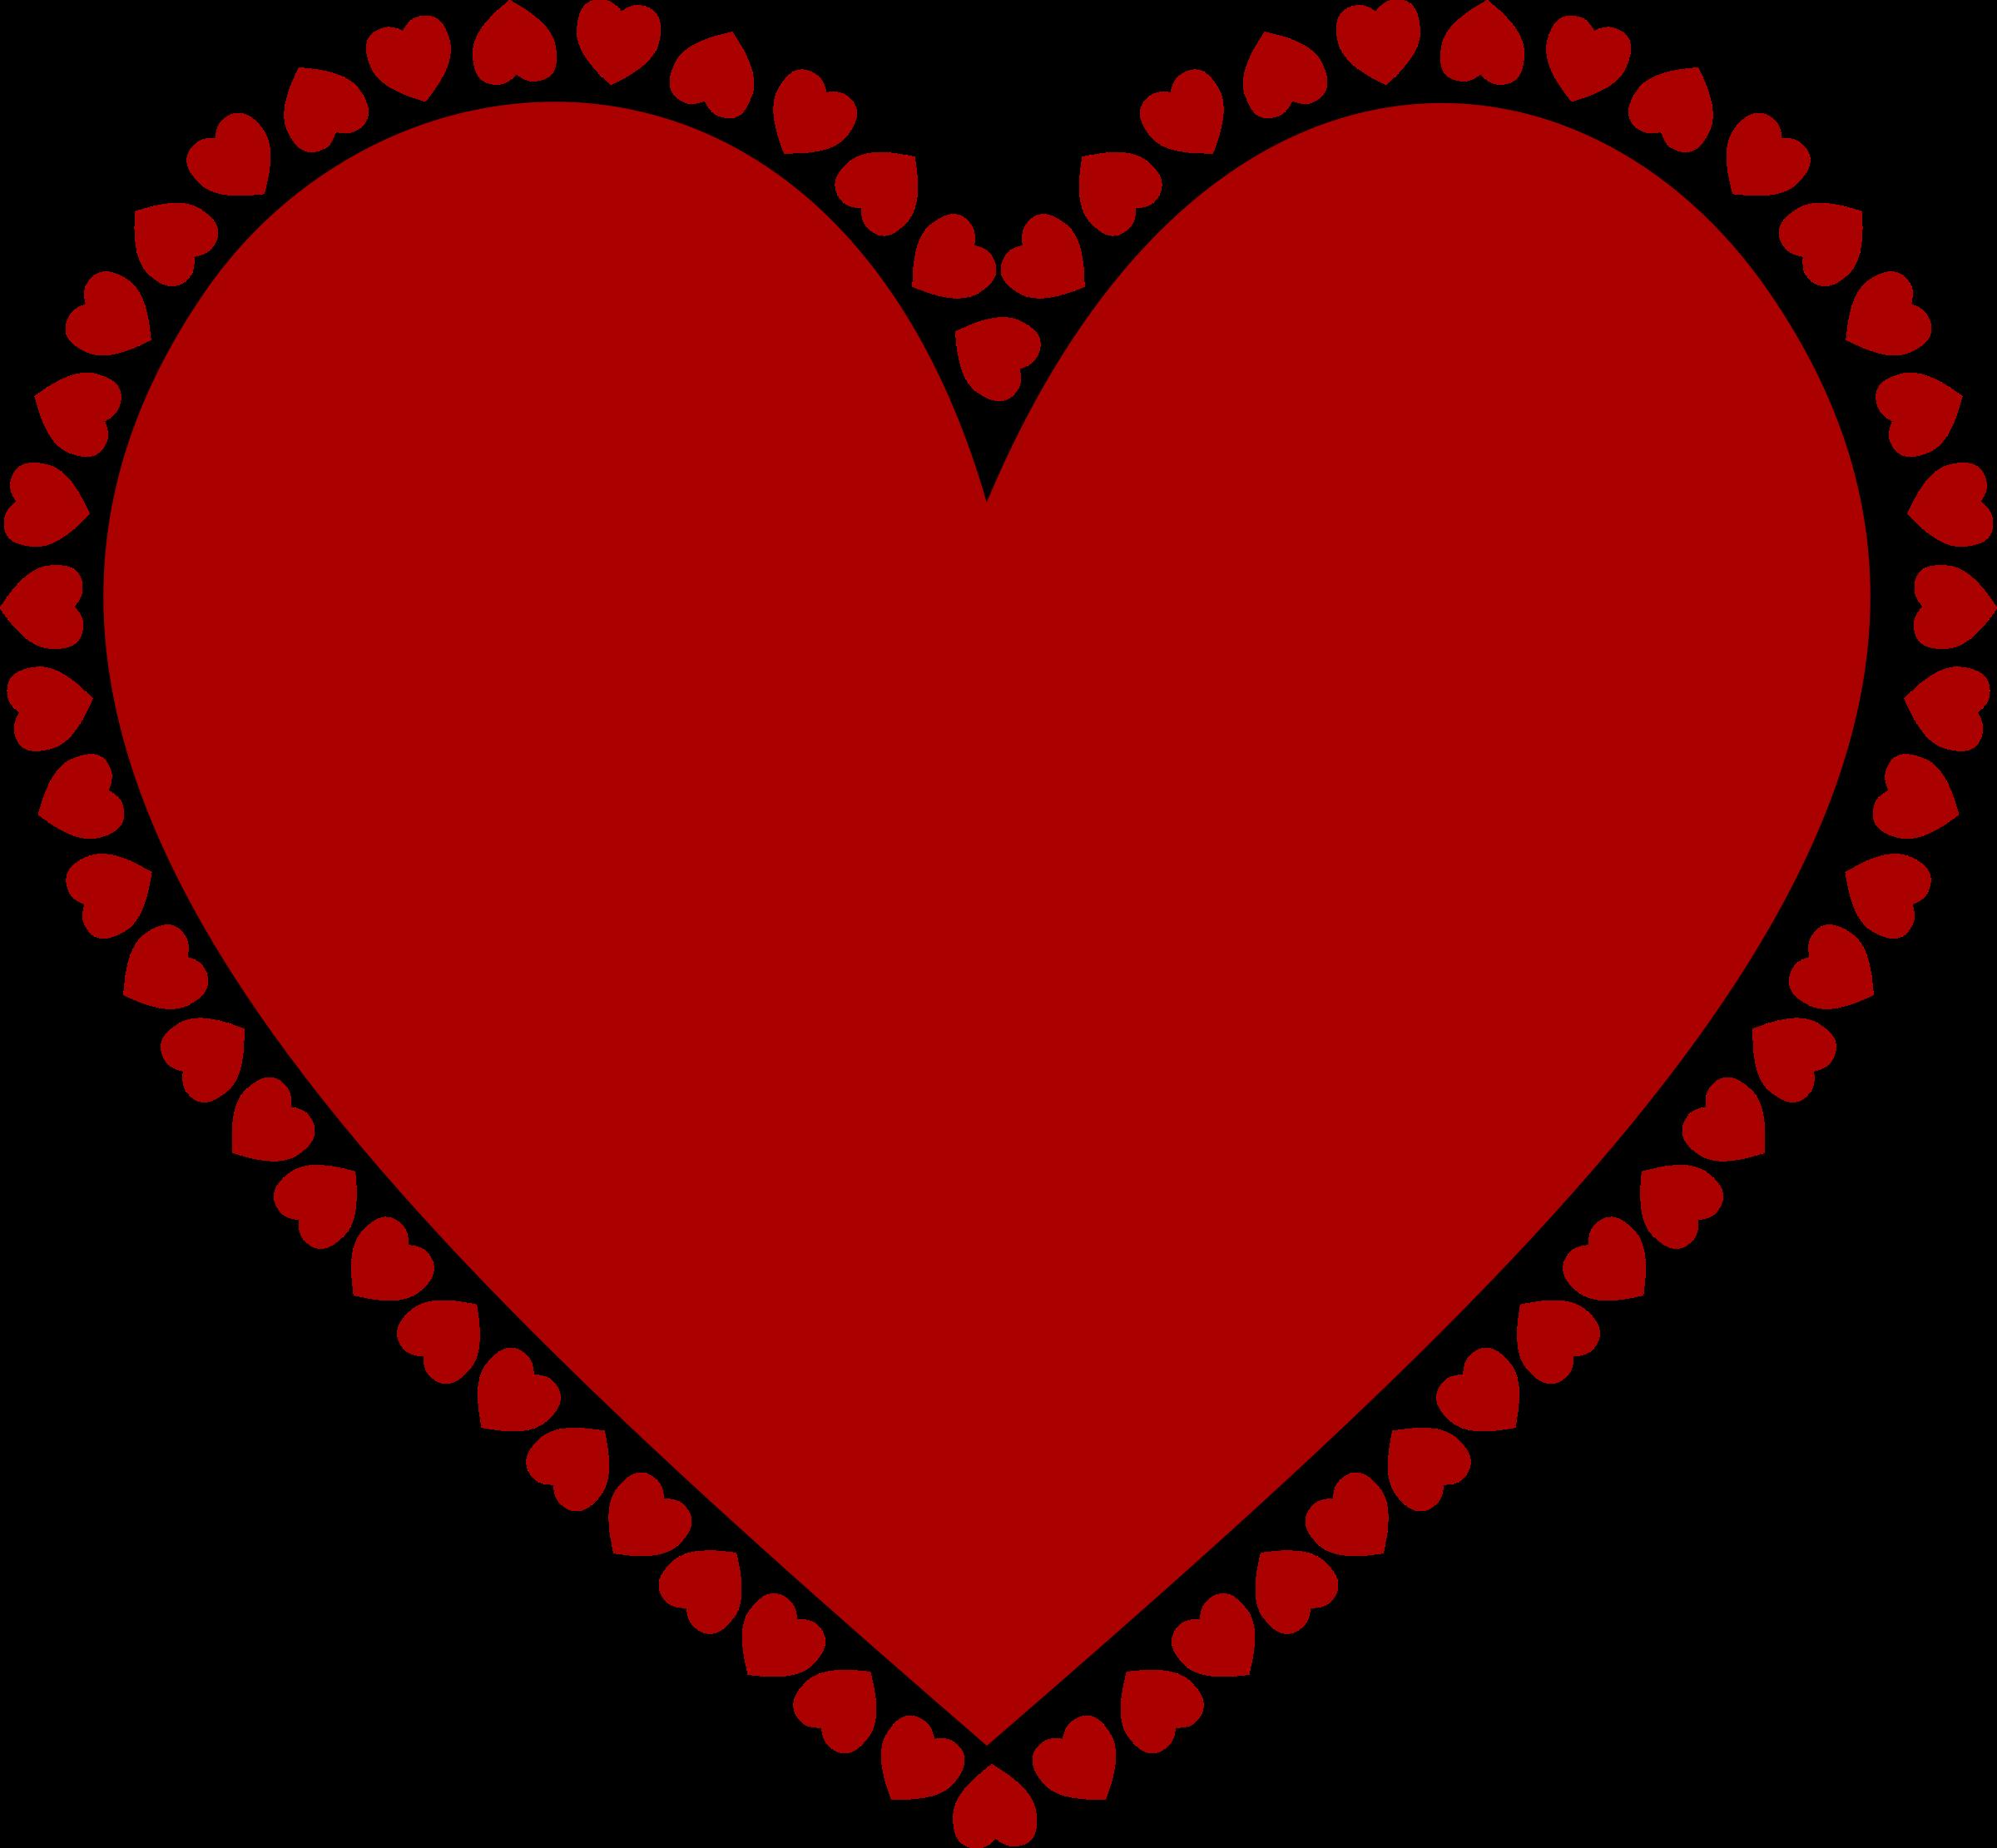 BIG IMAGE (PNG) - Heart PNG HD